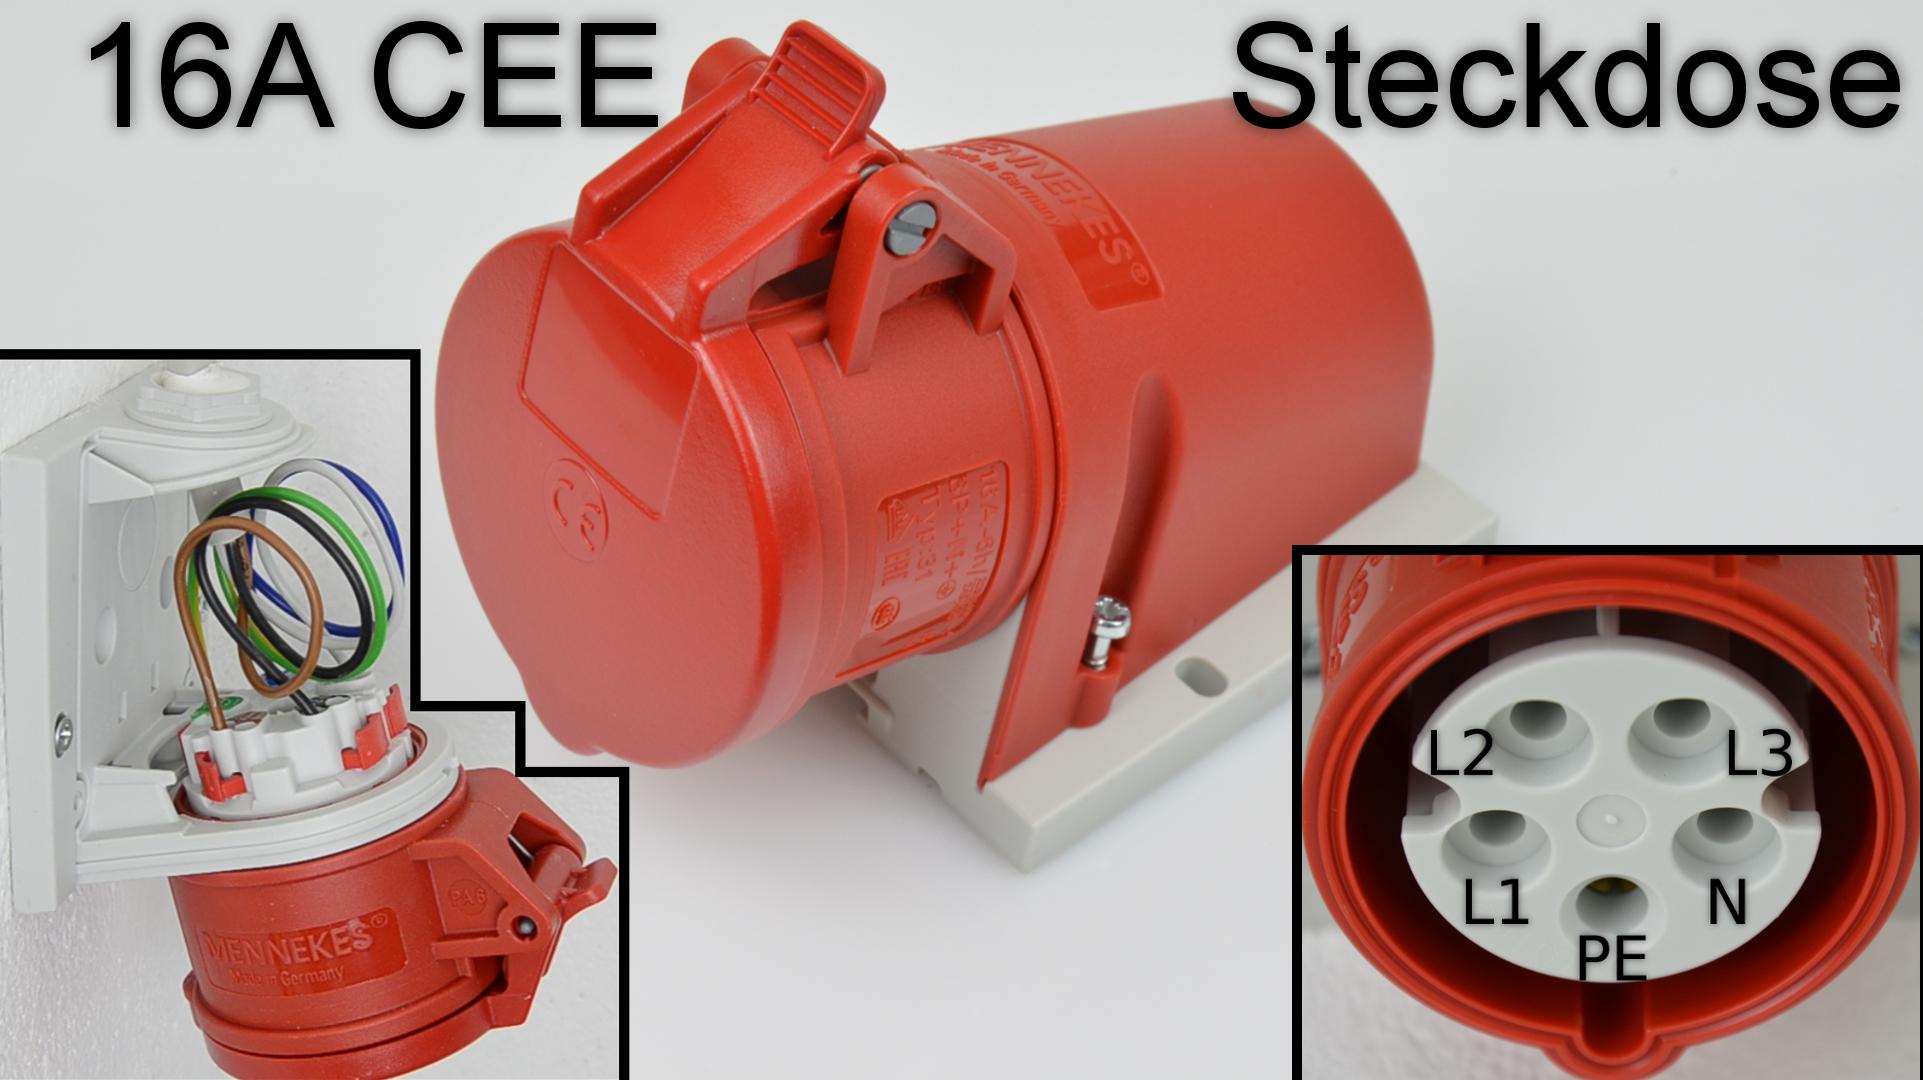 CEE Steckdose Thumbnail